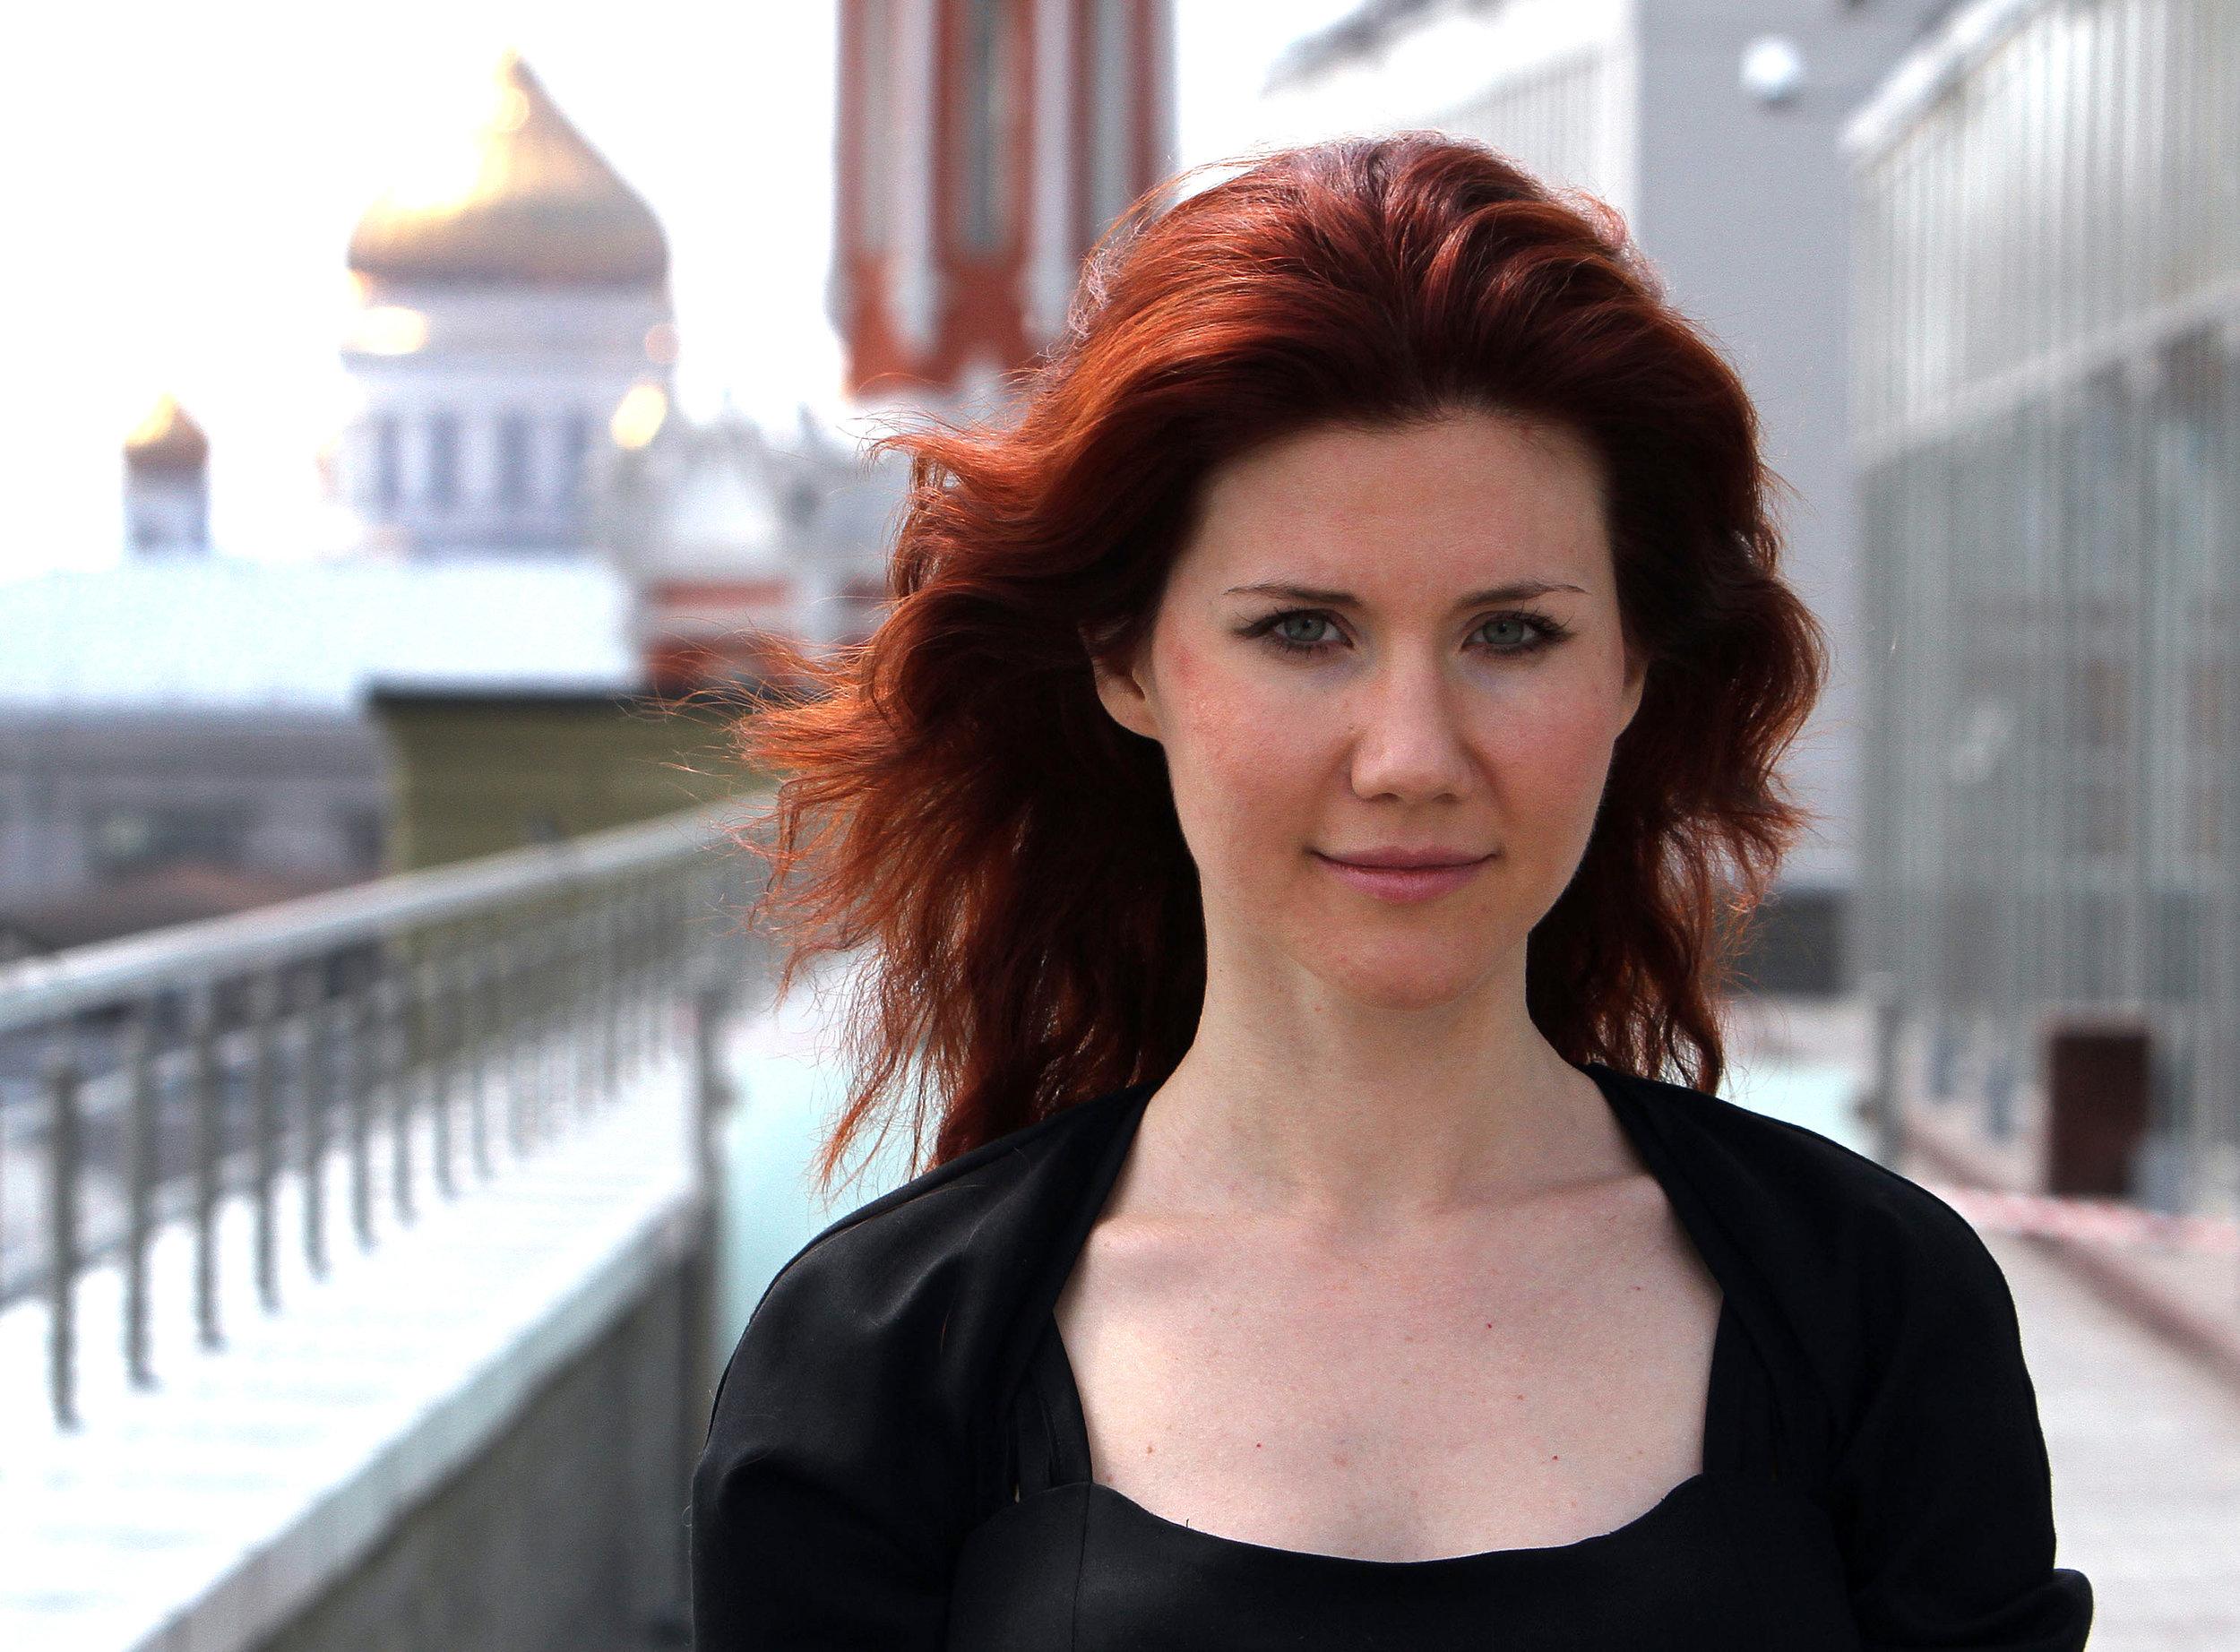 Russian agent Anna Chapman